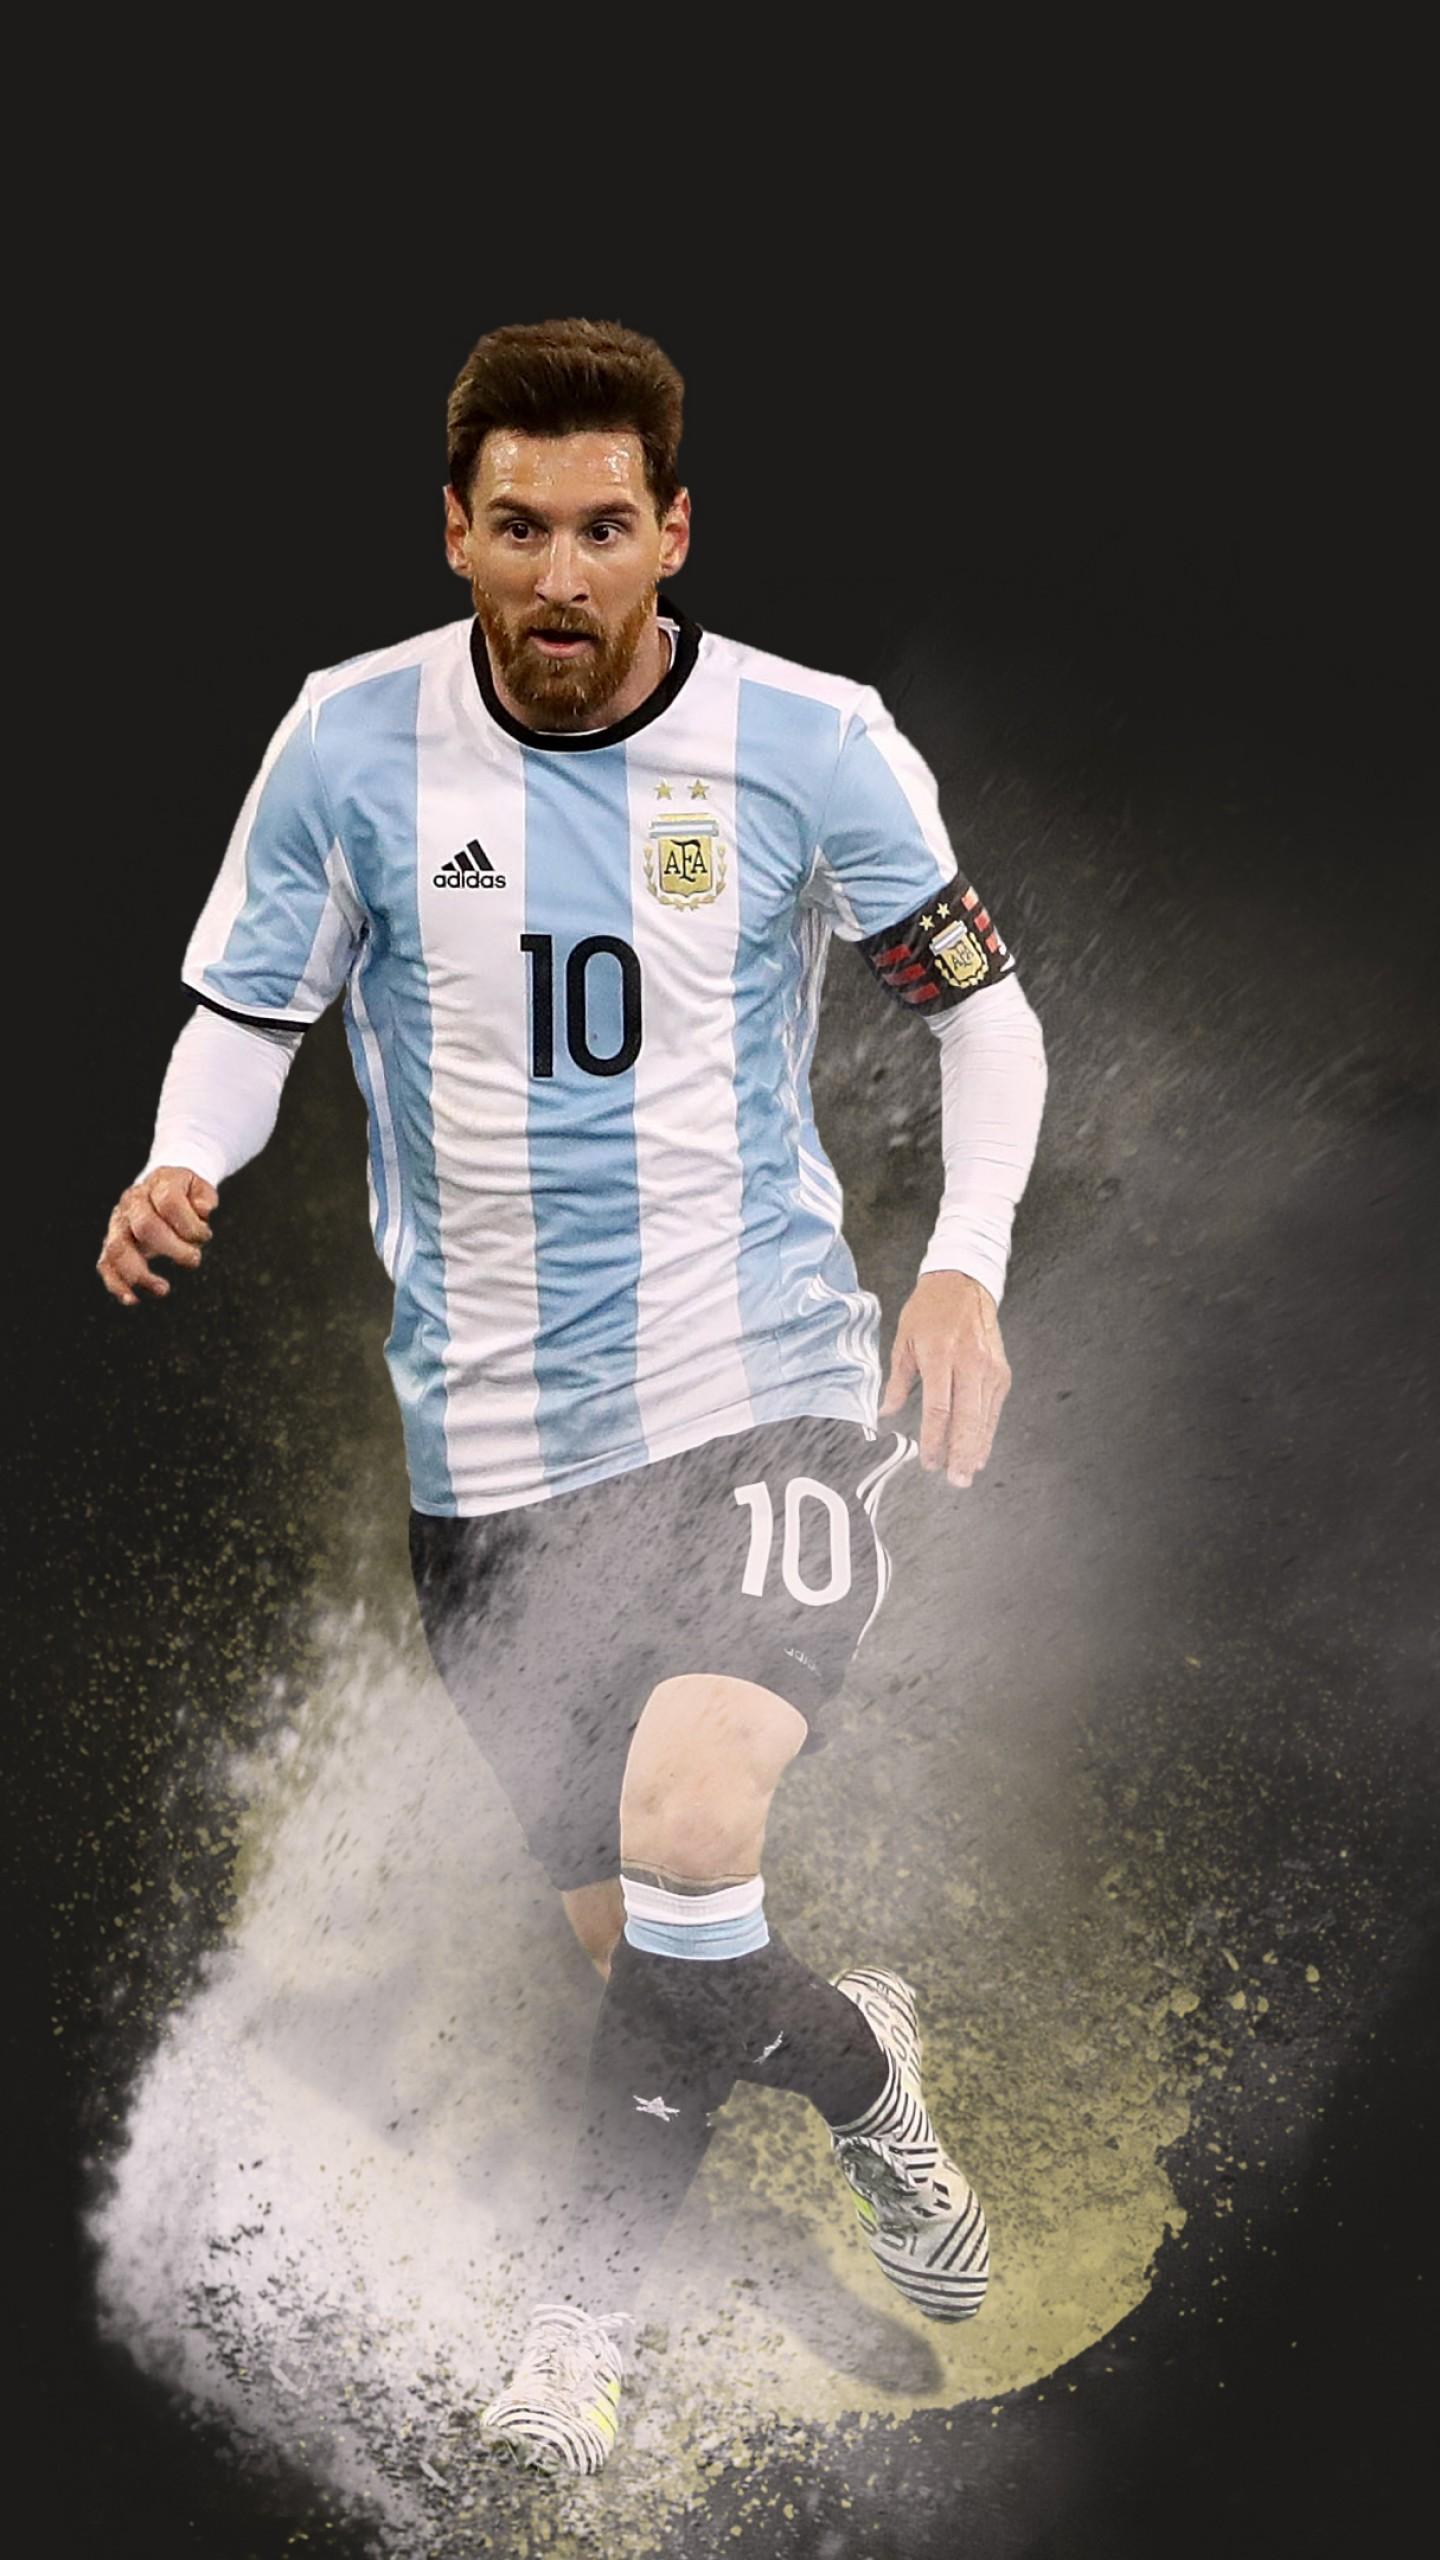 عکس زمینه لیونل مسی بازیکن بارسلونا در لباس تیم آرژانتین پس زمینه